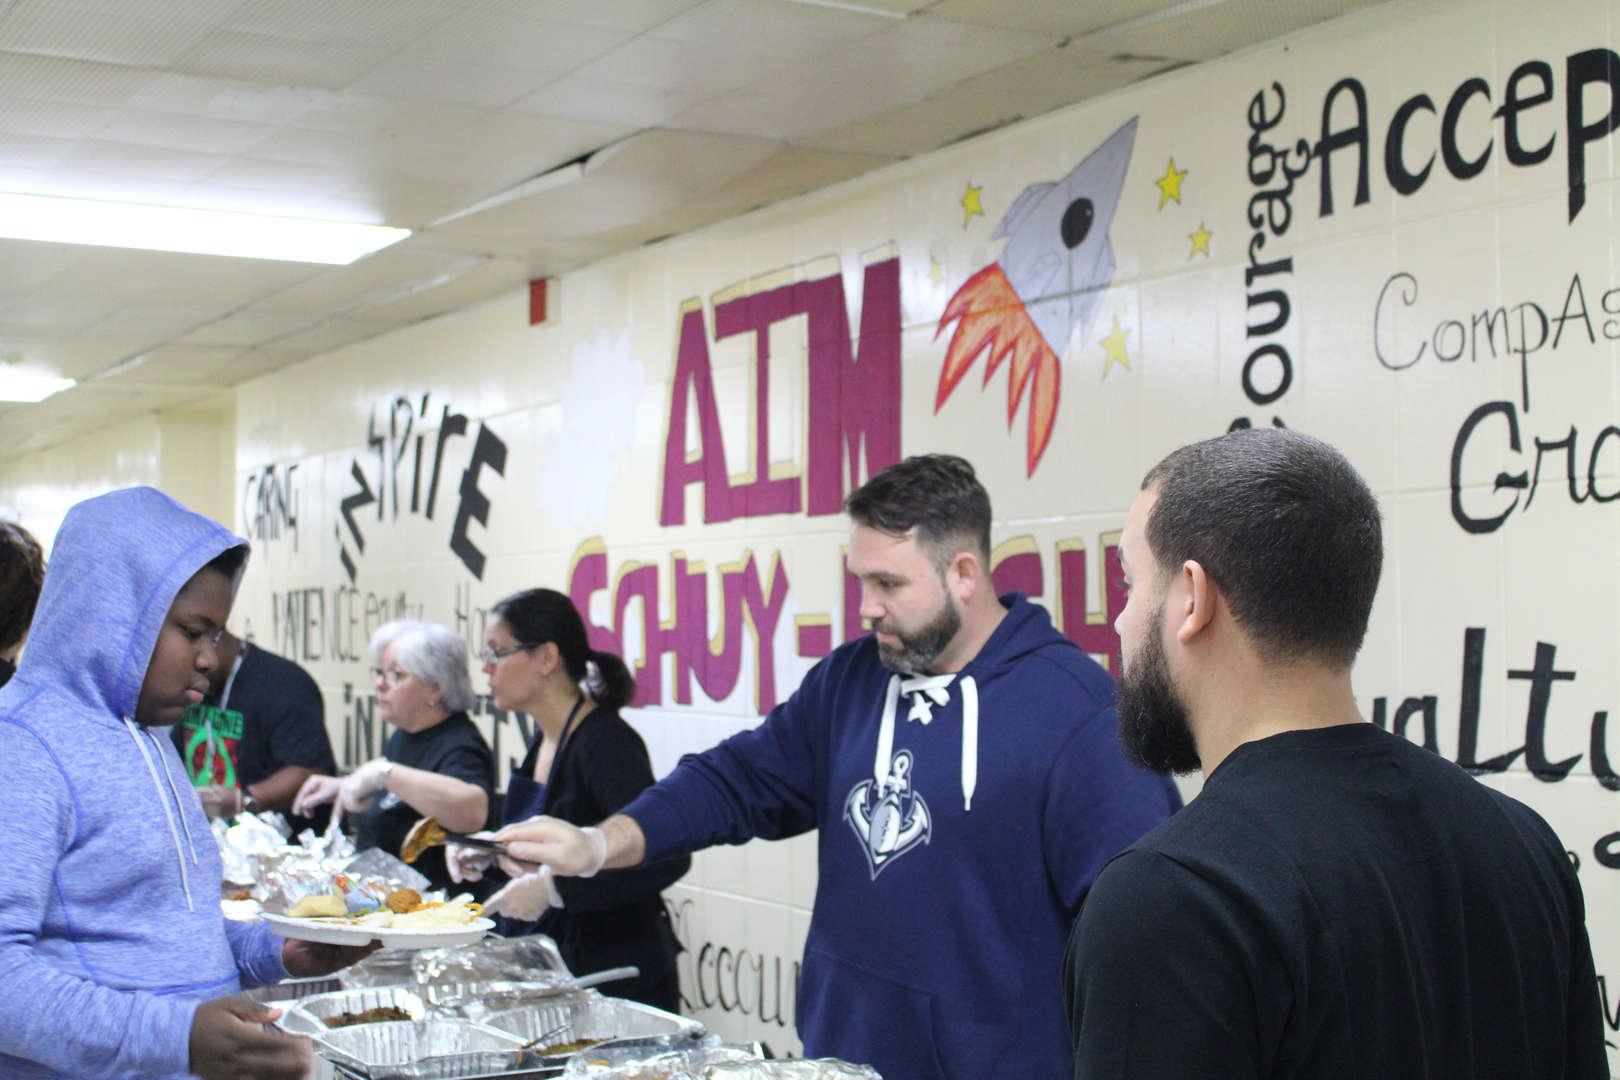 Tamburro serves food Thanksgiving Feast 2017